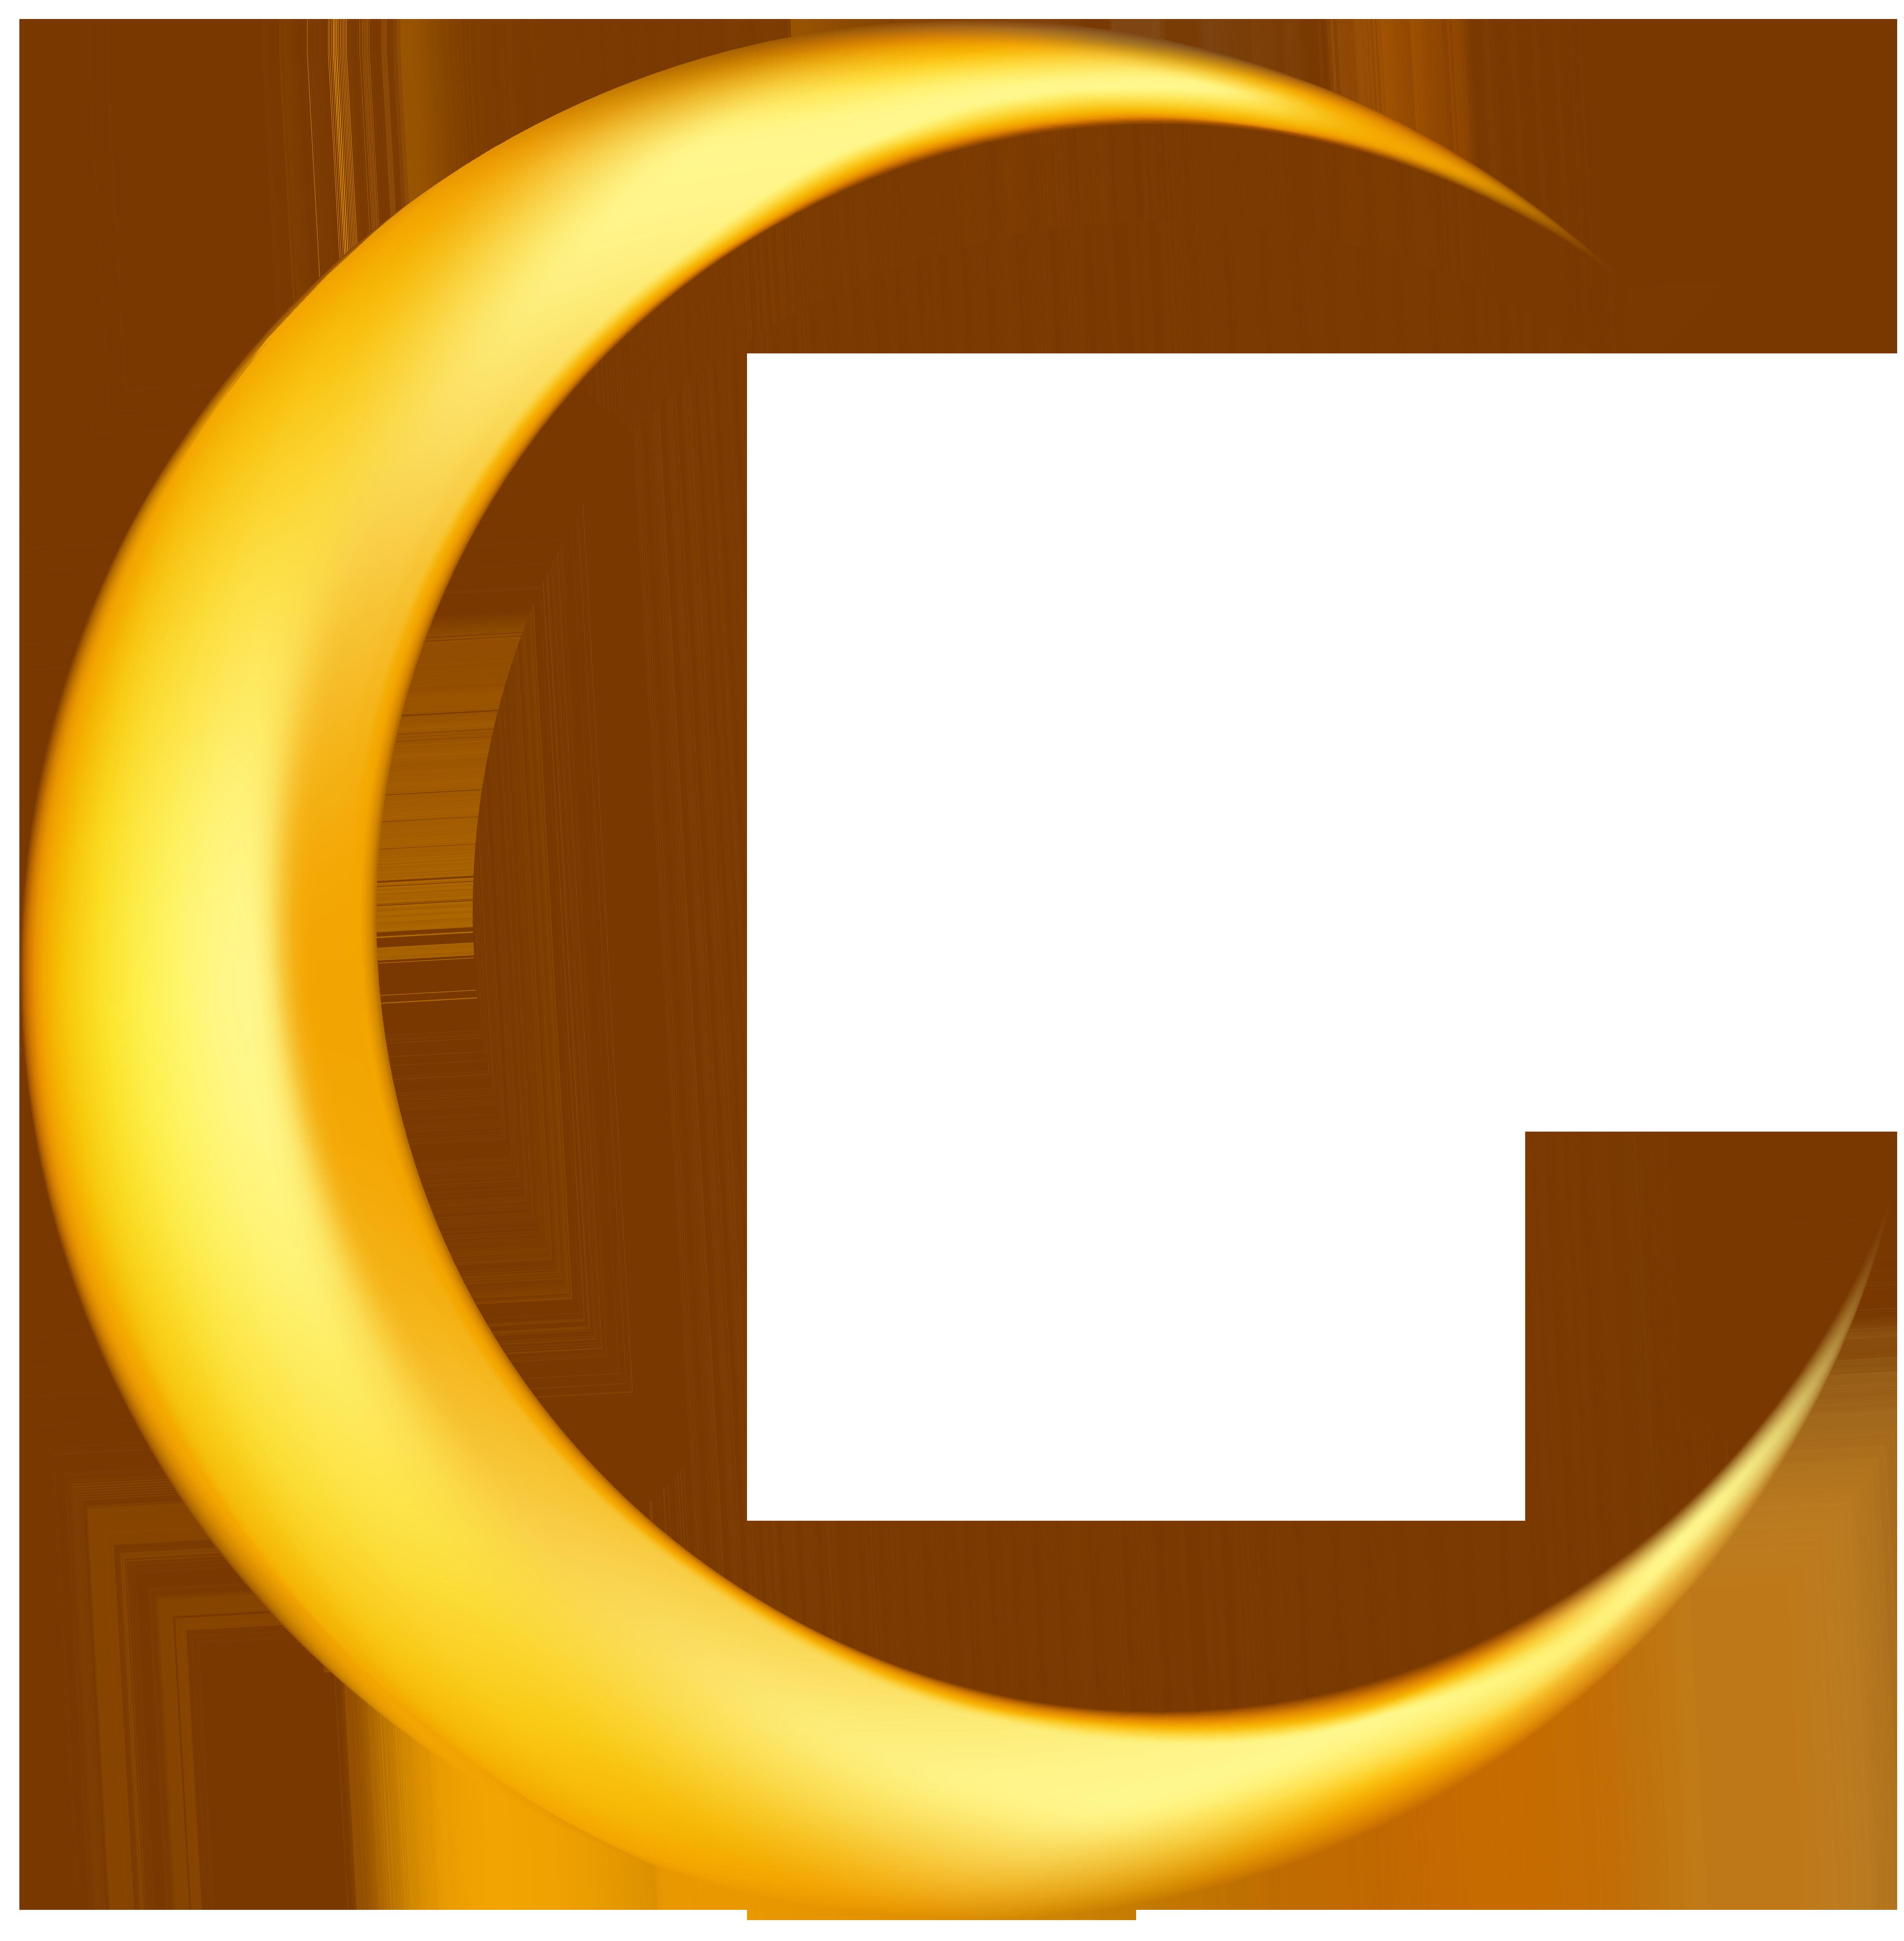 5011x5108 Yellow New Moon Png Clip Art Imageu200b Gallery Yopriceville